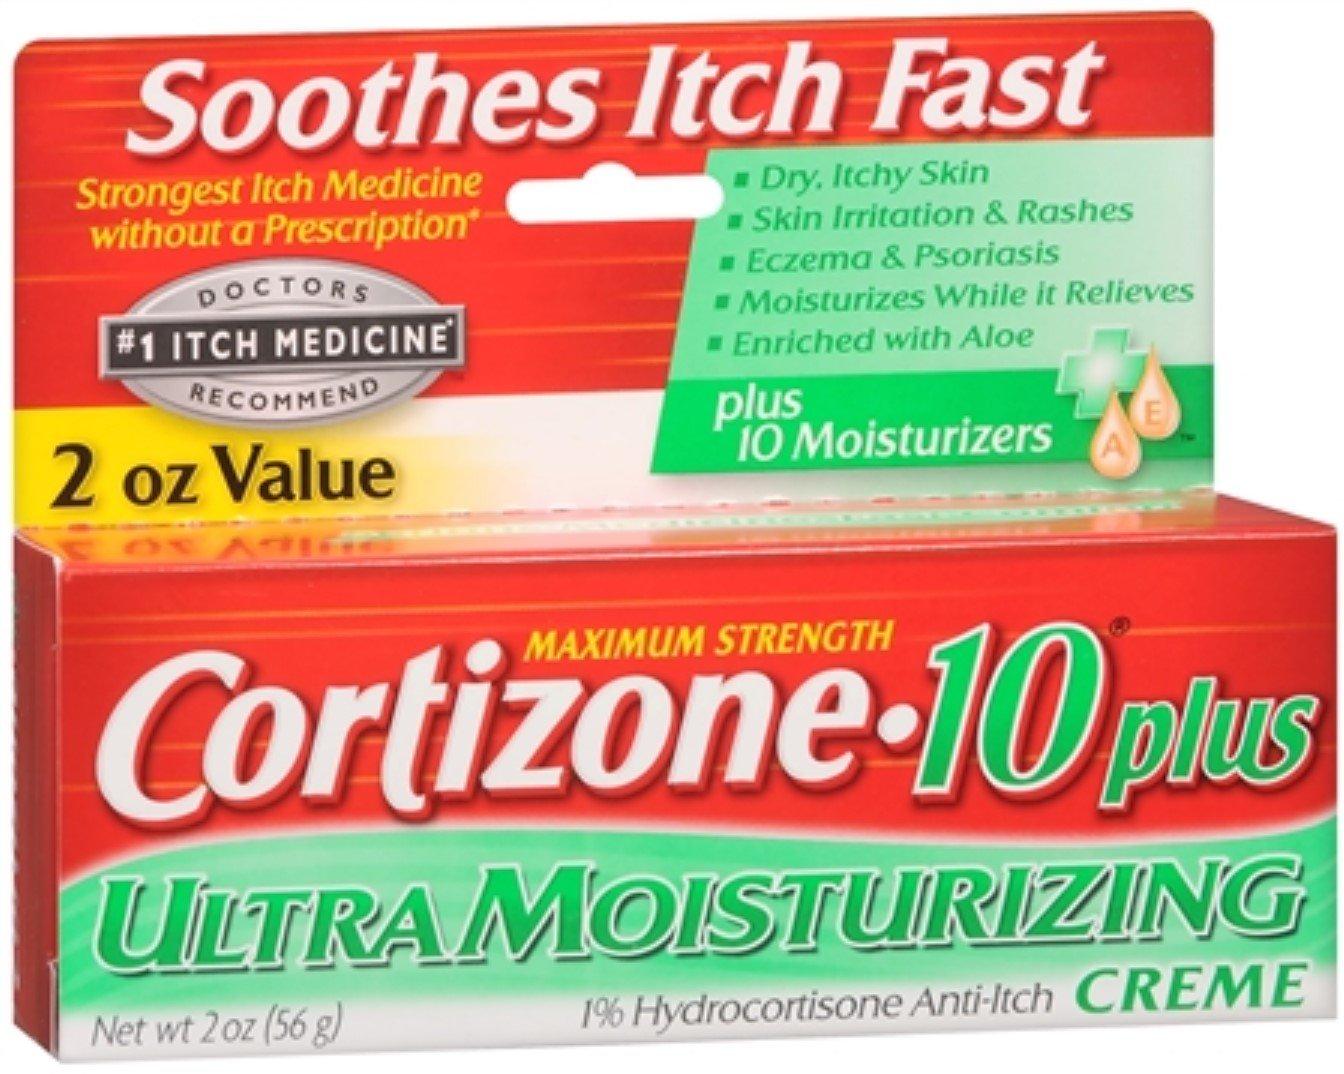 Cortizone-10 Plus Maximum Strength Anti-Itch Creme 2 oz (Pack of 11)